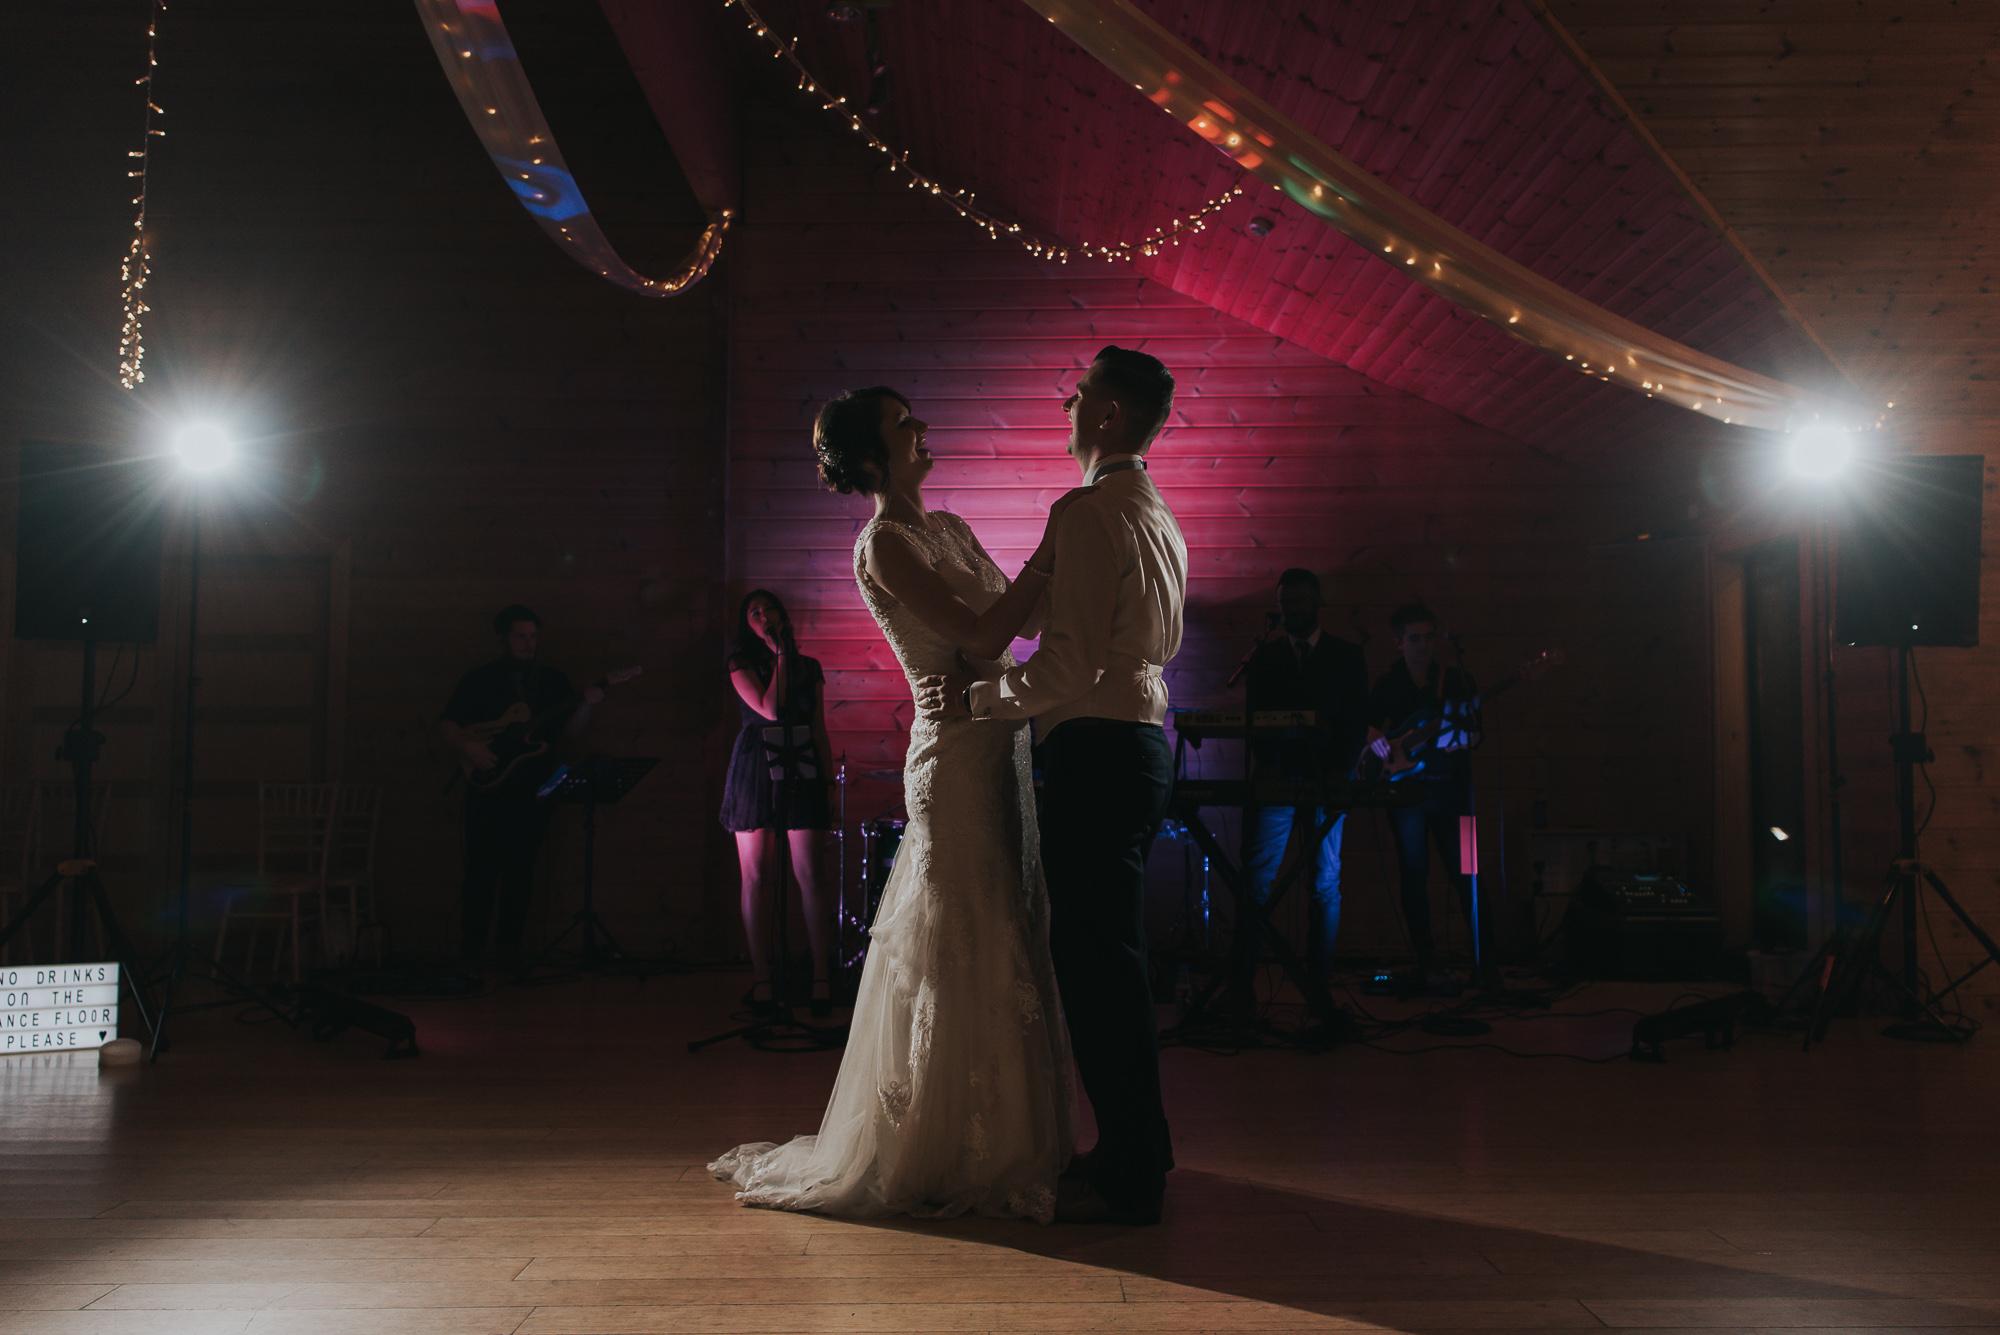 Beeston Manor Wedding Photographer based in cheshire covering Lancashire weddings and surounding areas of the northwest uk (4 of 6).jpg